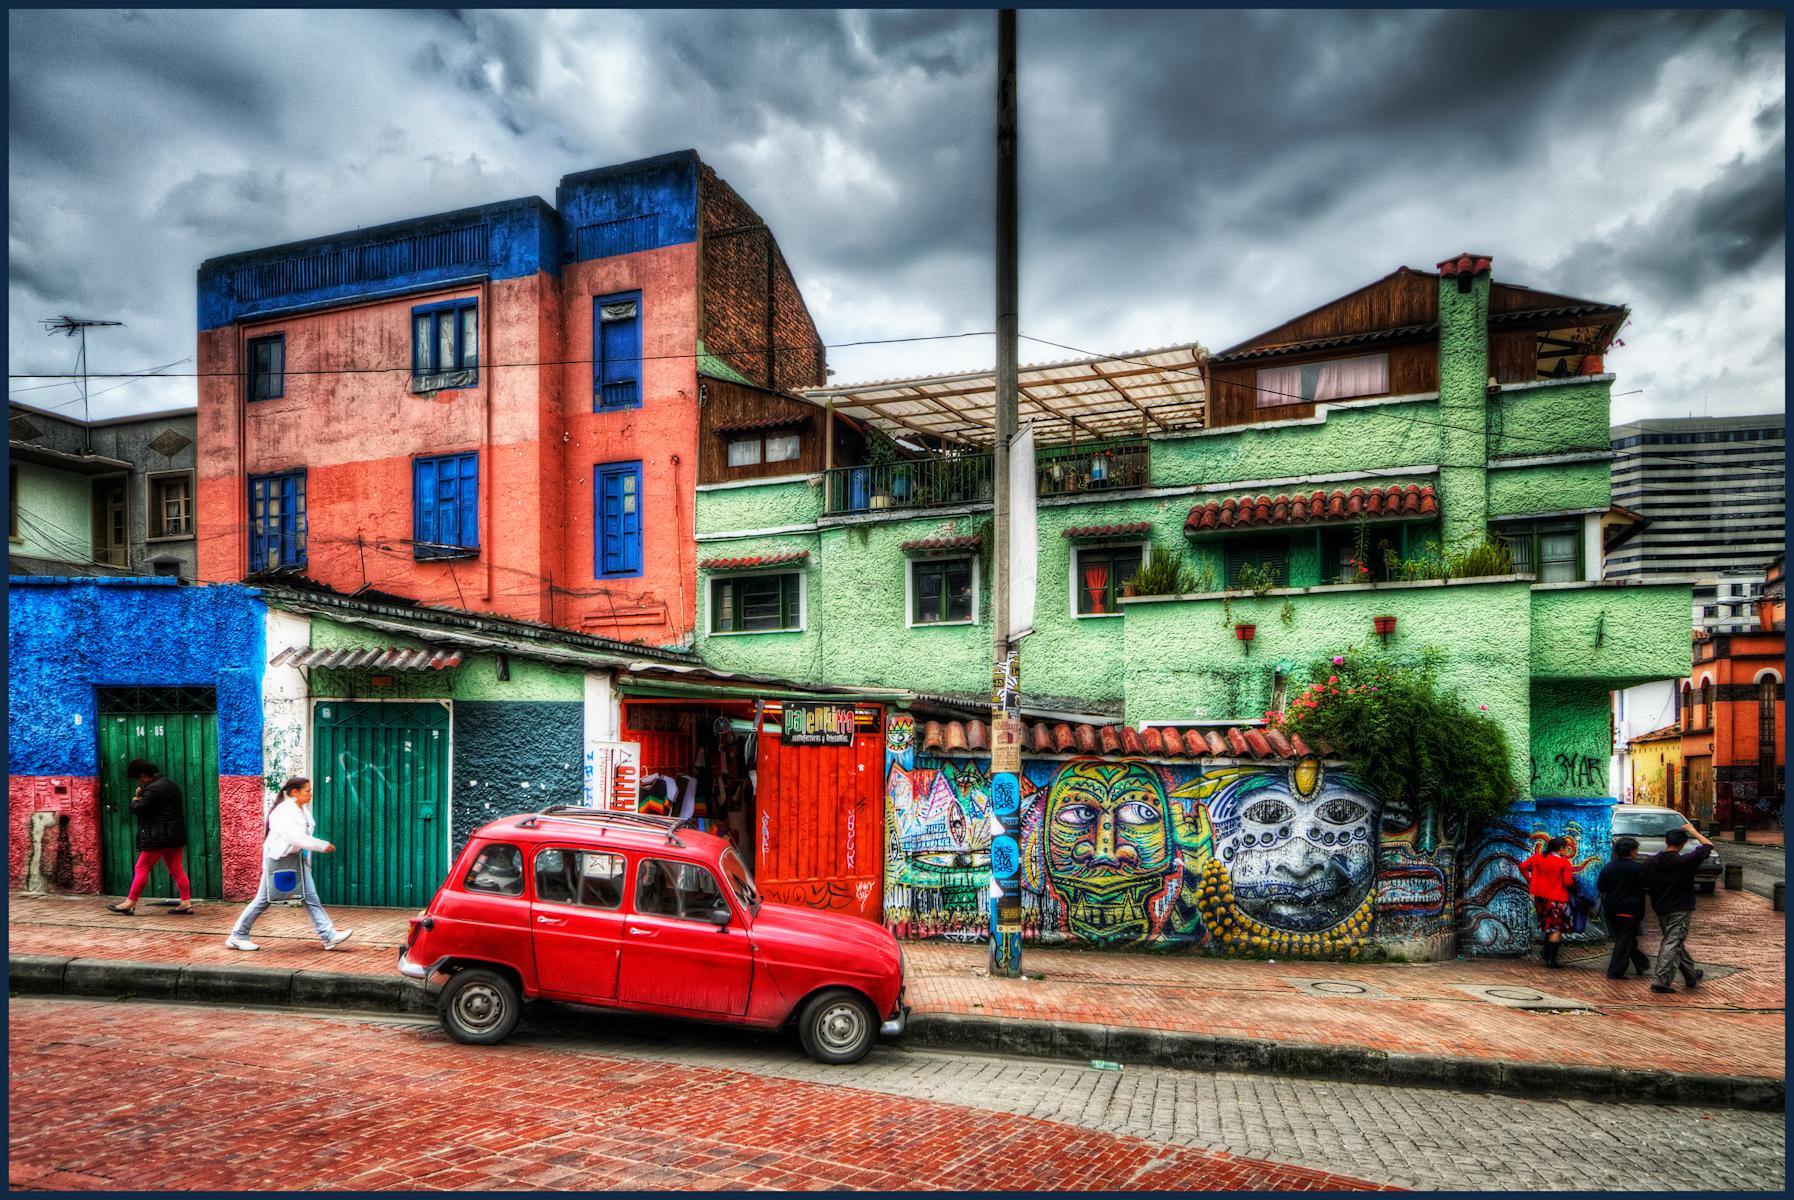 FileLa Candelaria Bogota Colombia 5758241115jpg